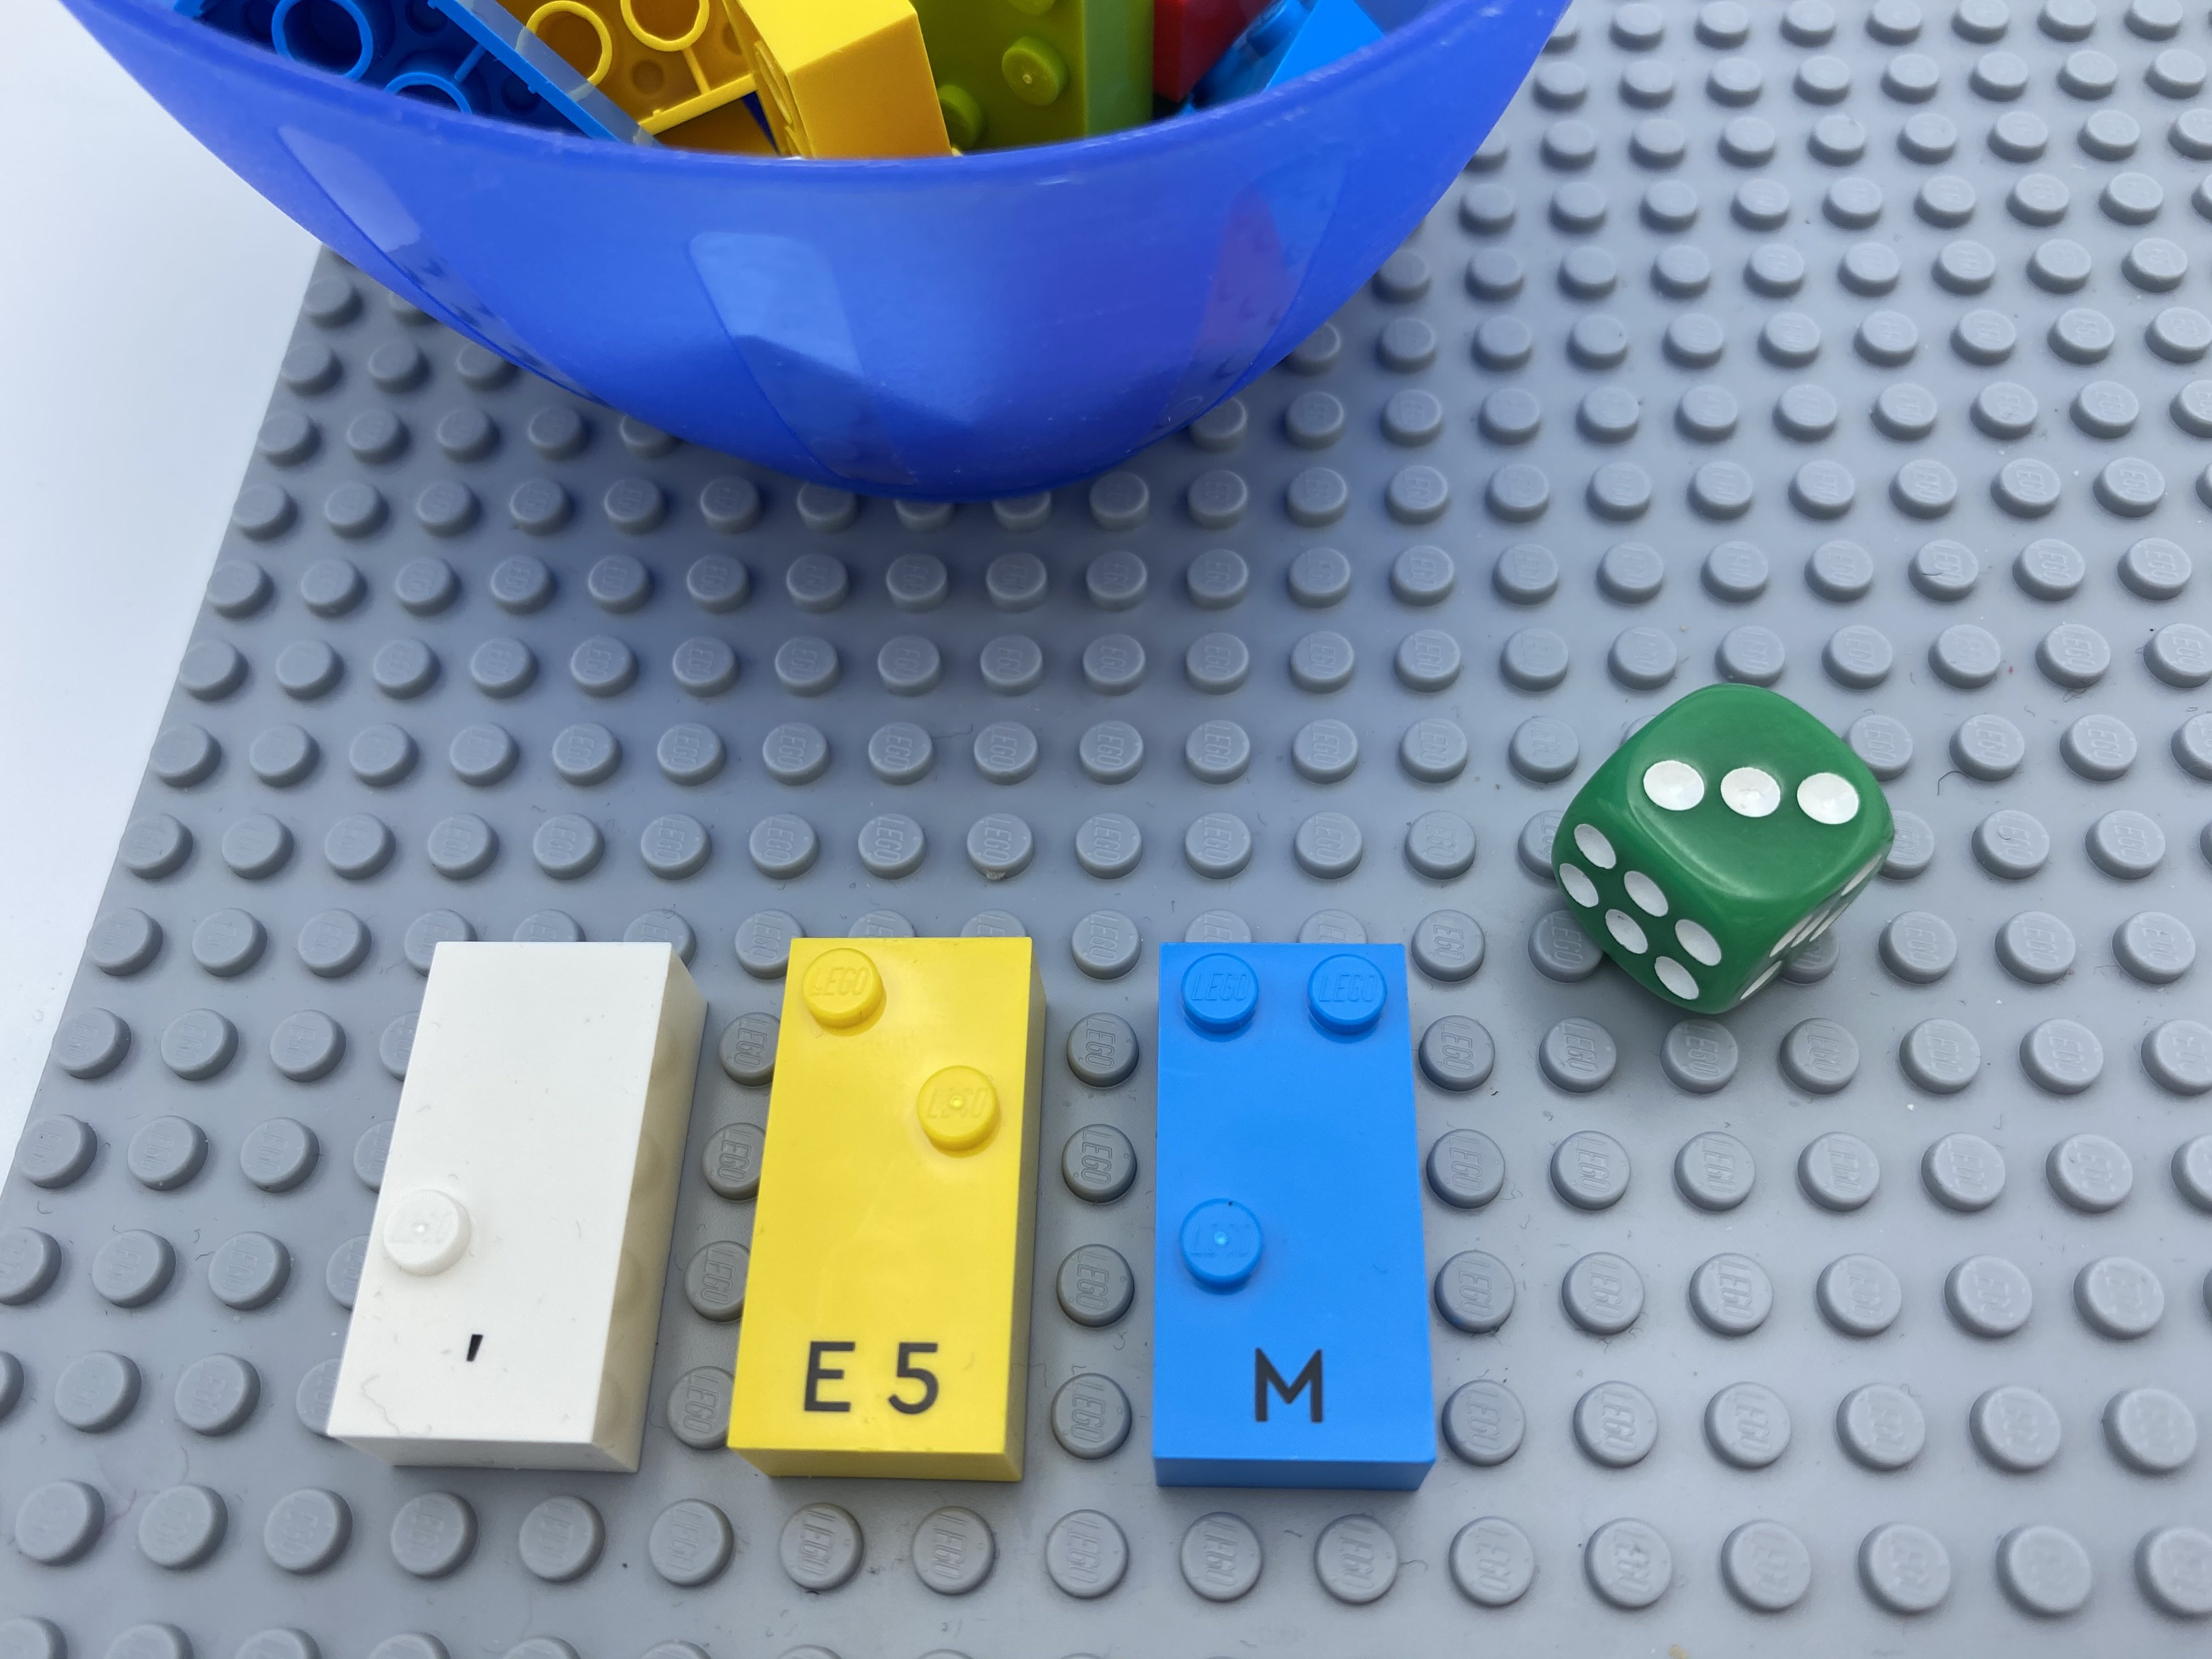 die roll = 2 3, letter brick m.